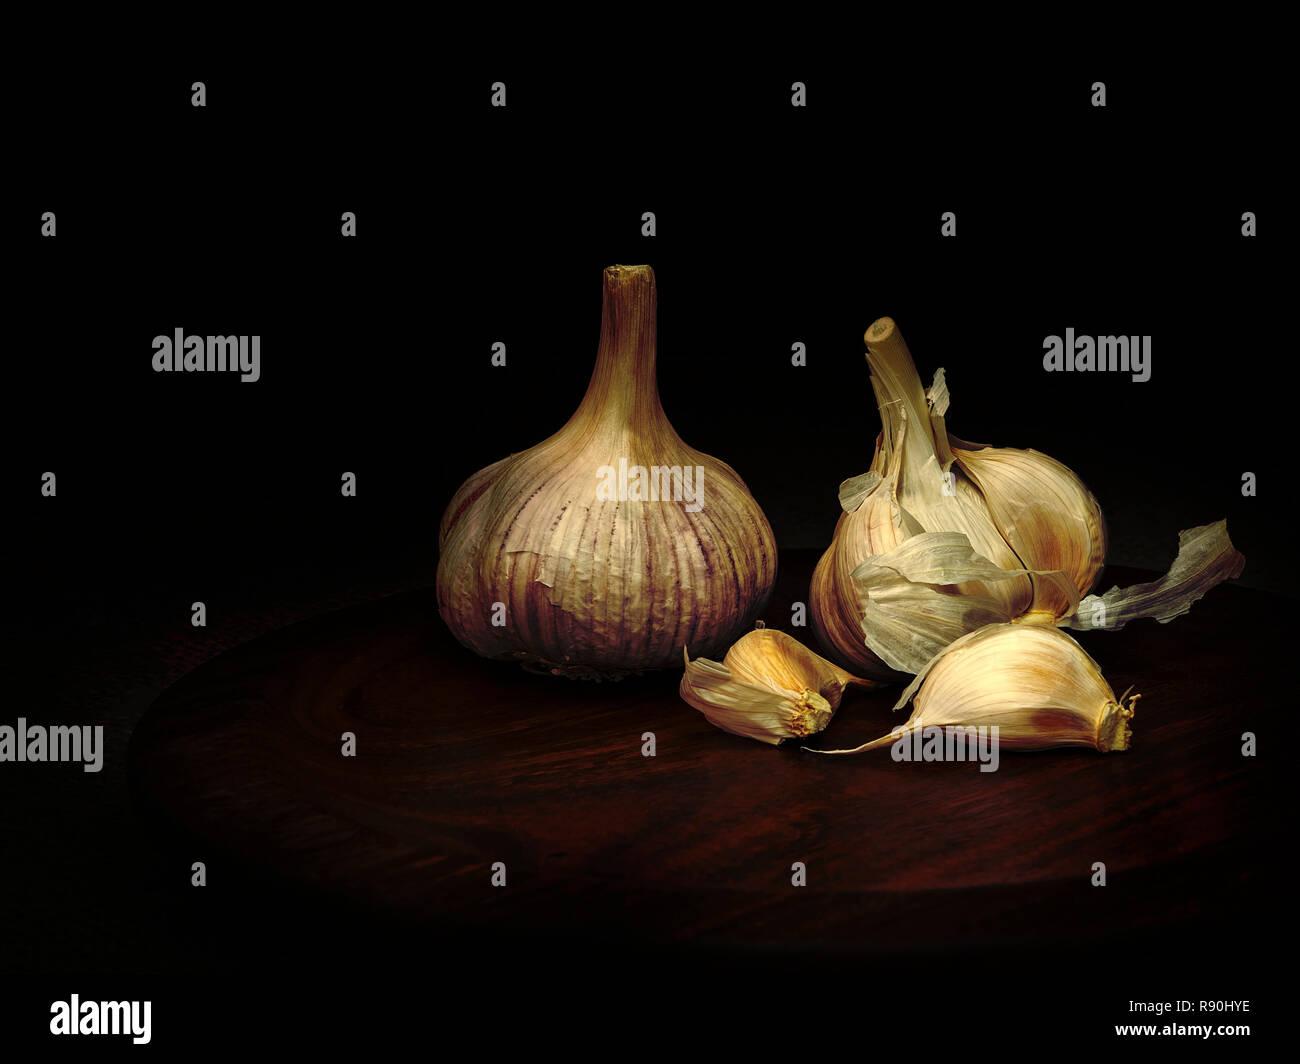 Chiaroscuro garlic on wooden plate. Still life, light painting. - Stock Image